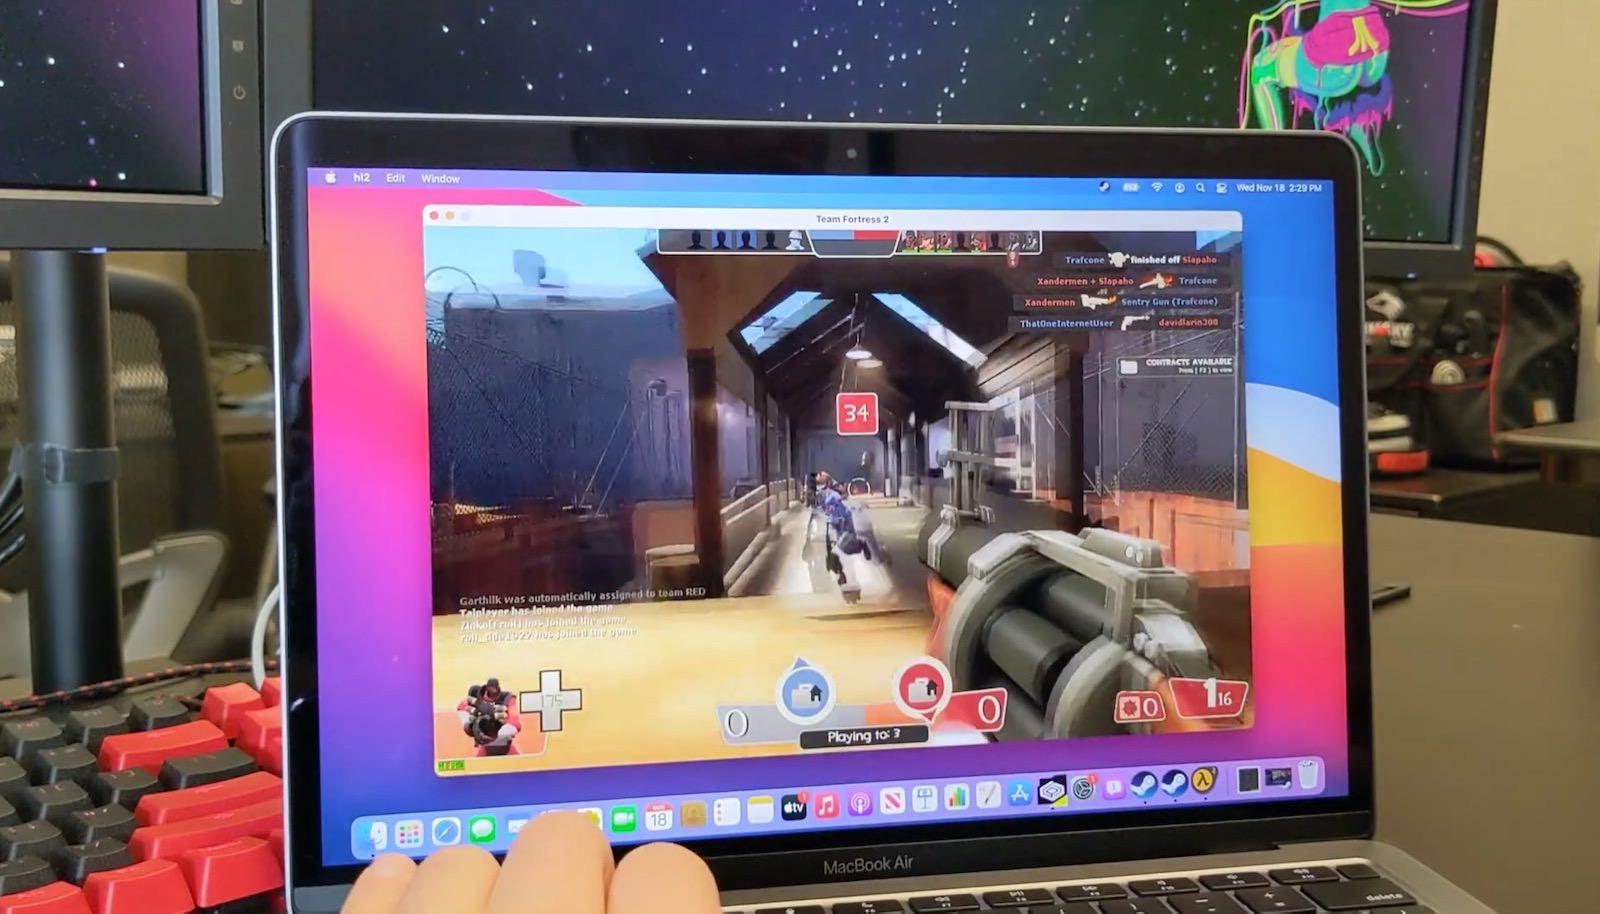 Codeweavers crossover20 windows